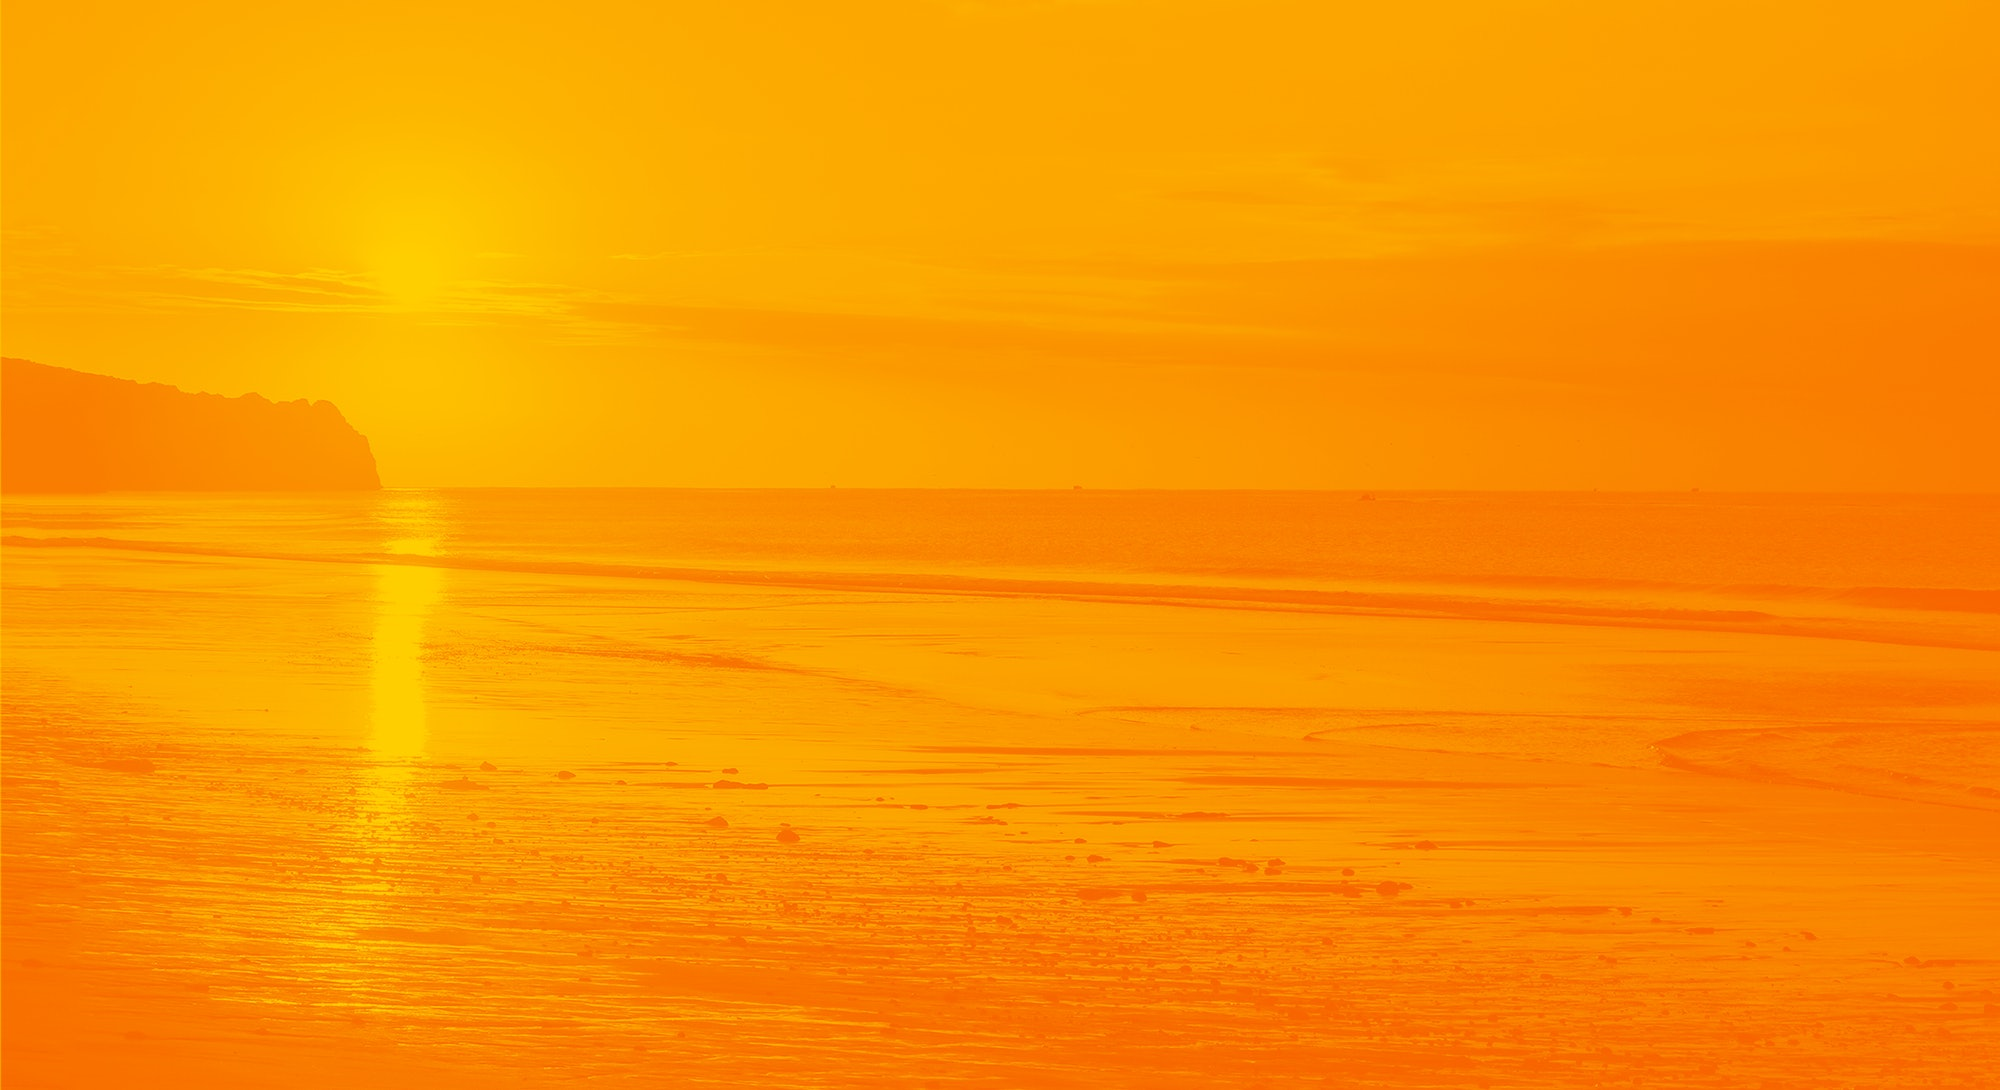 Sunset sea sand beach landscape. Sunset beach horizon. Sea sand sunset beach horizon panorama. Sunset beach landscape